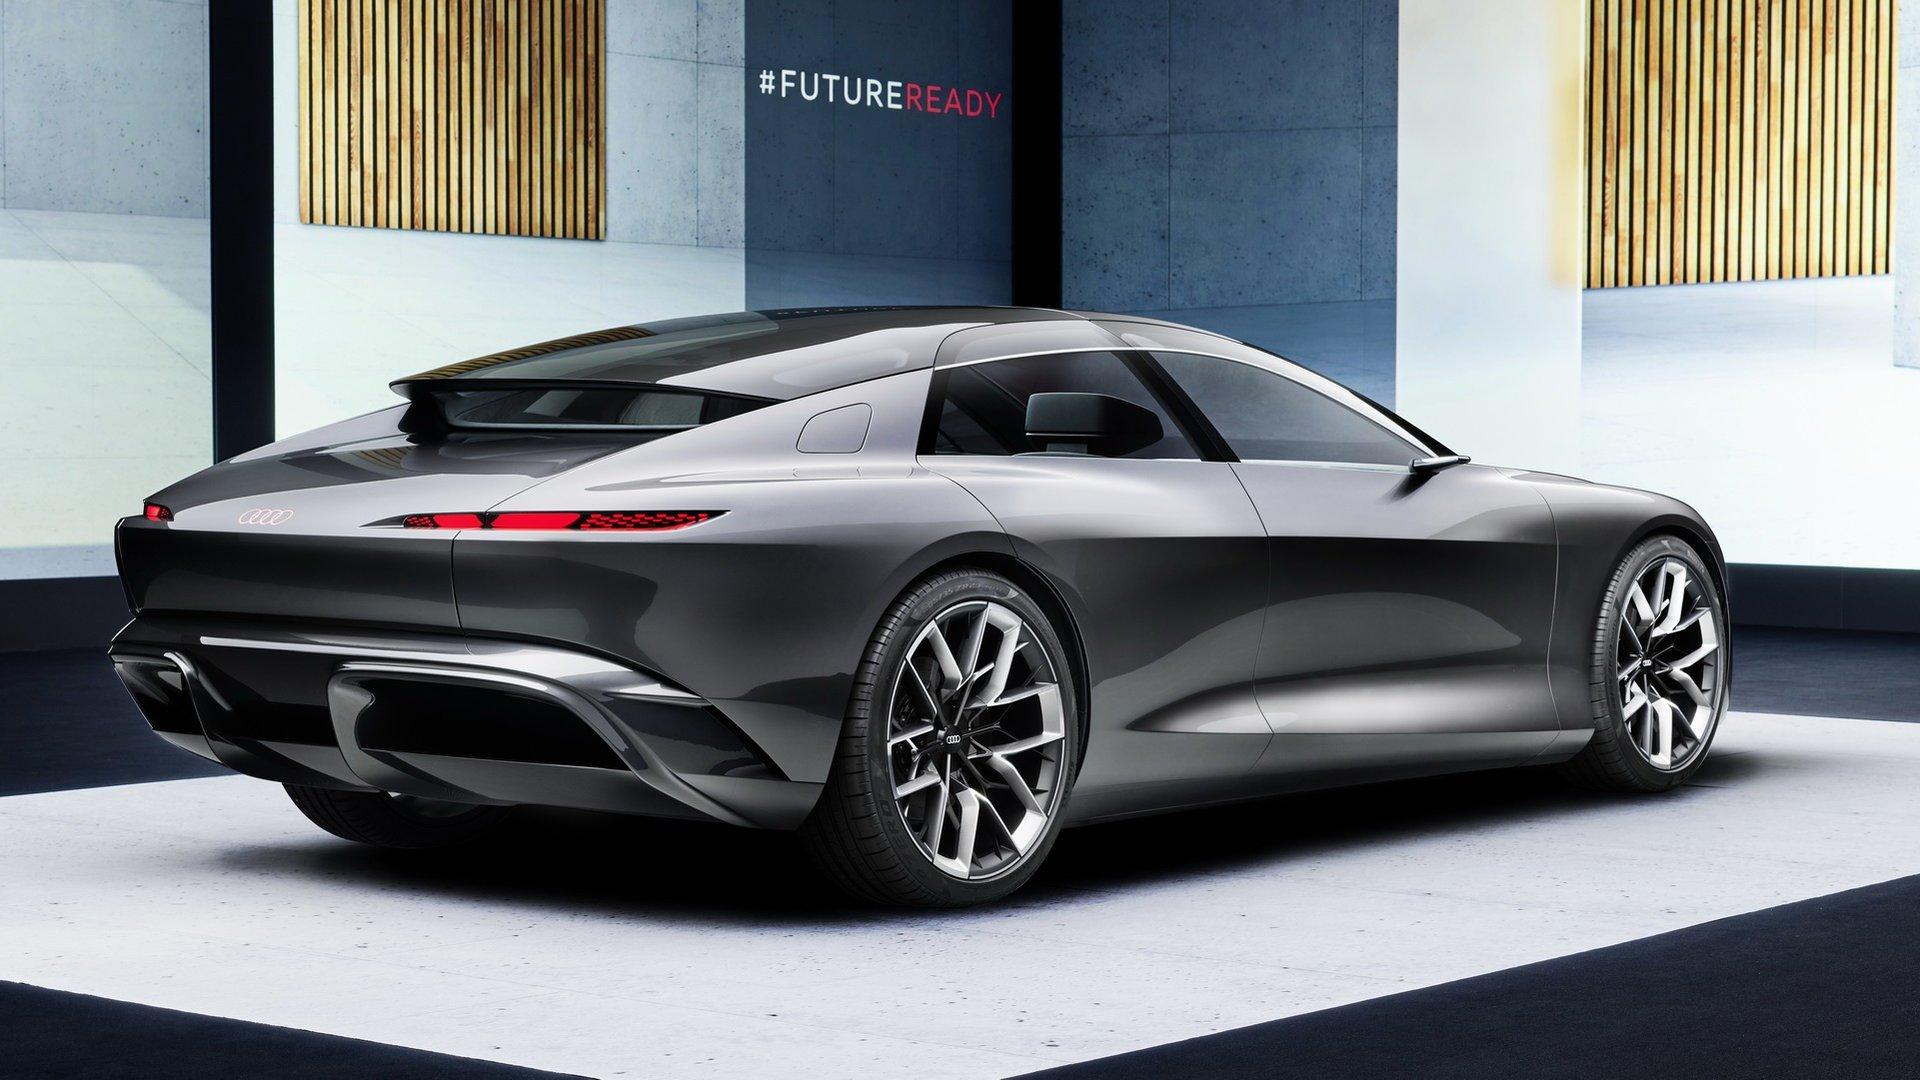 Audi-Grand-Sphere-Concept-2054.jpg